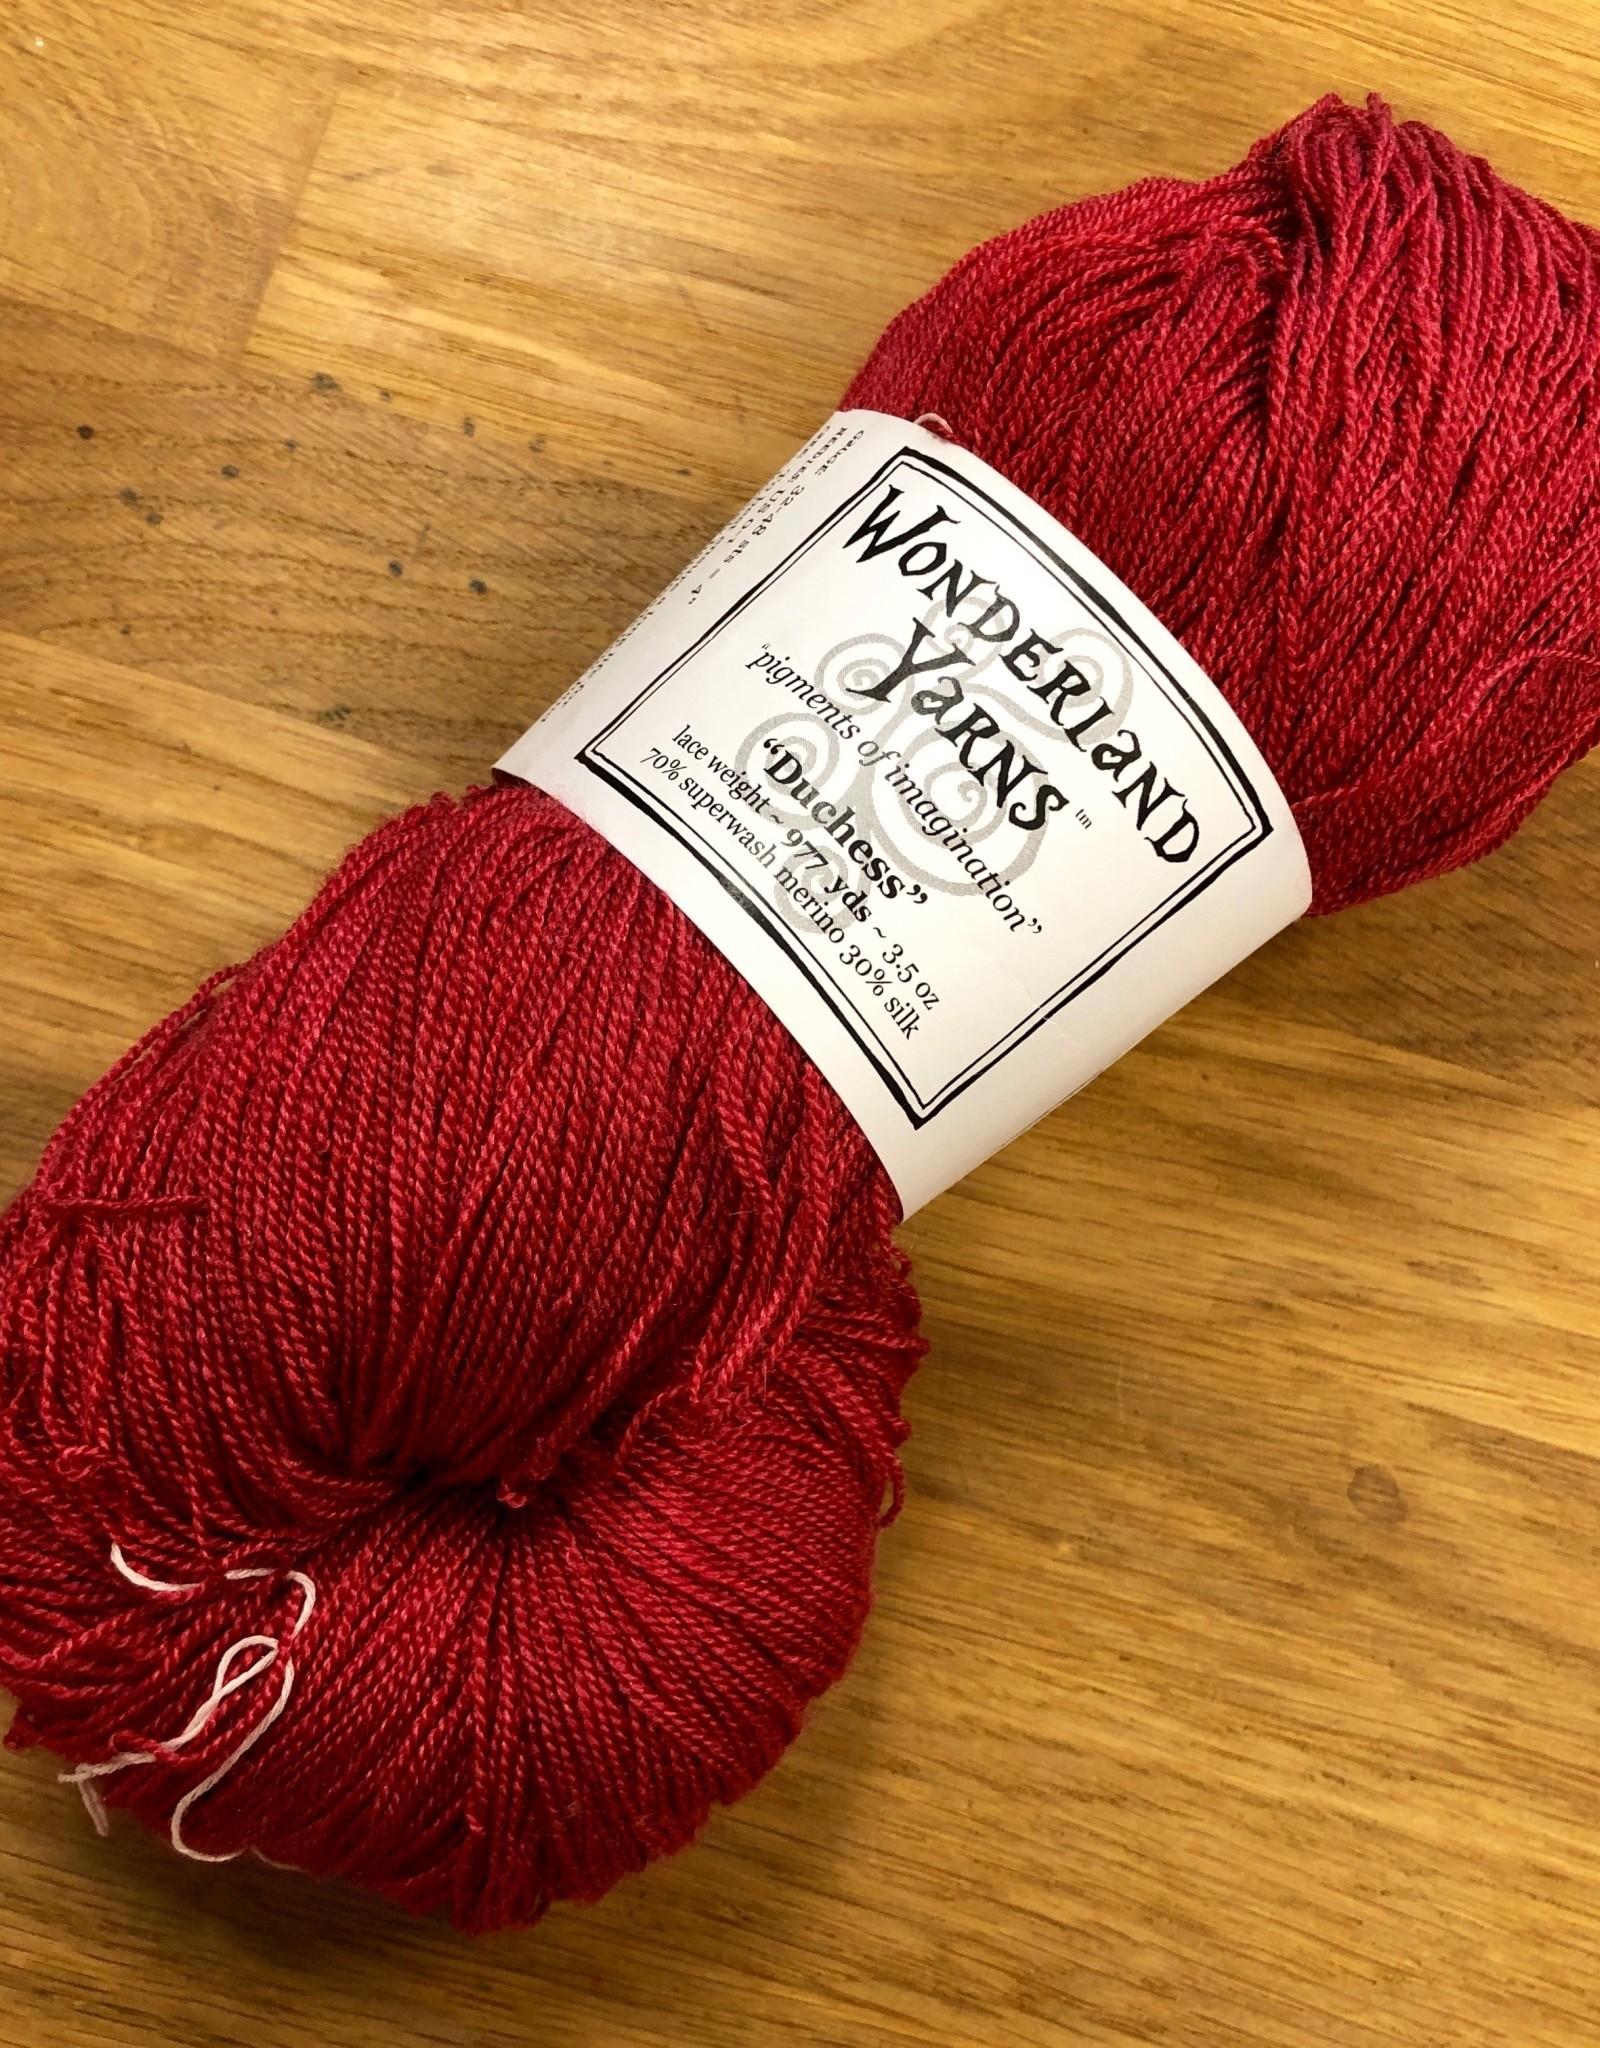 Wonderland Yarn Duchess Lace by Wonderland Yarns